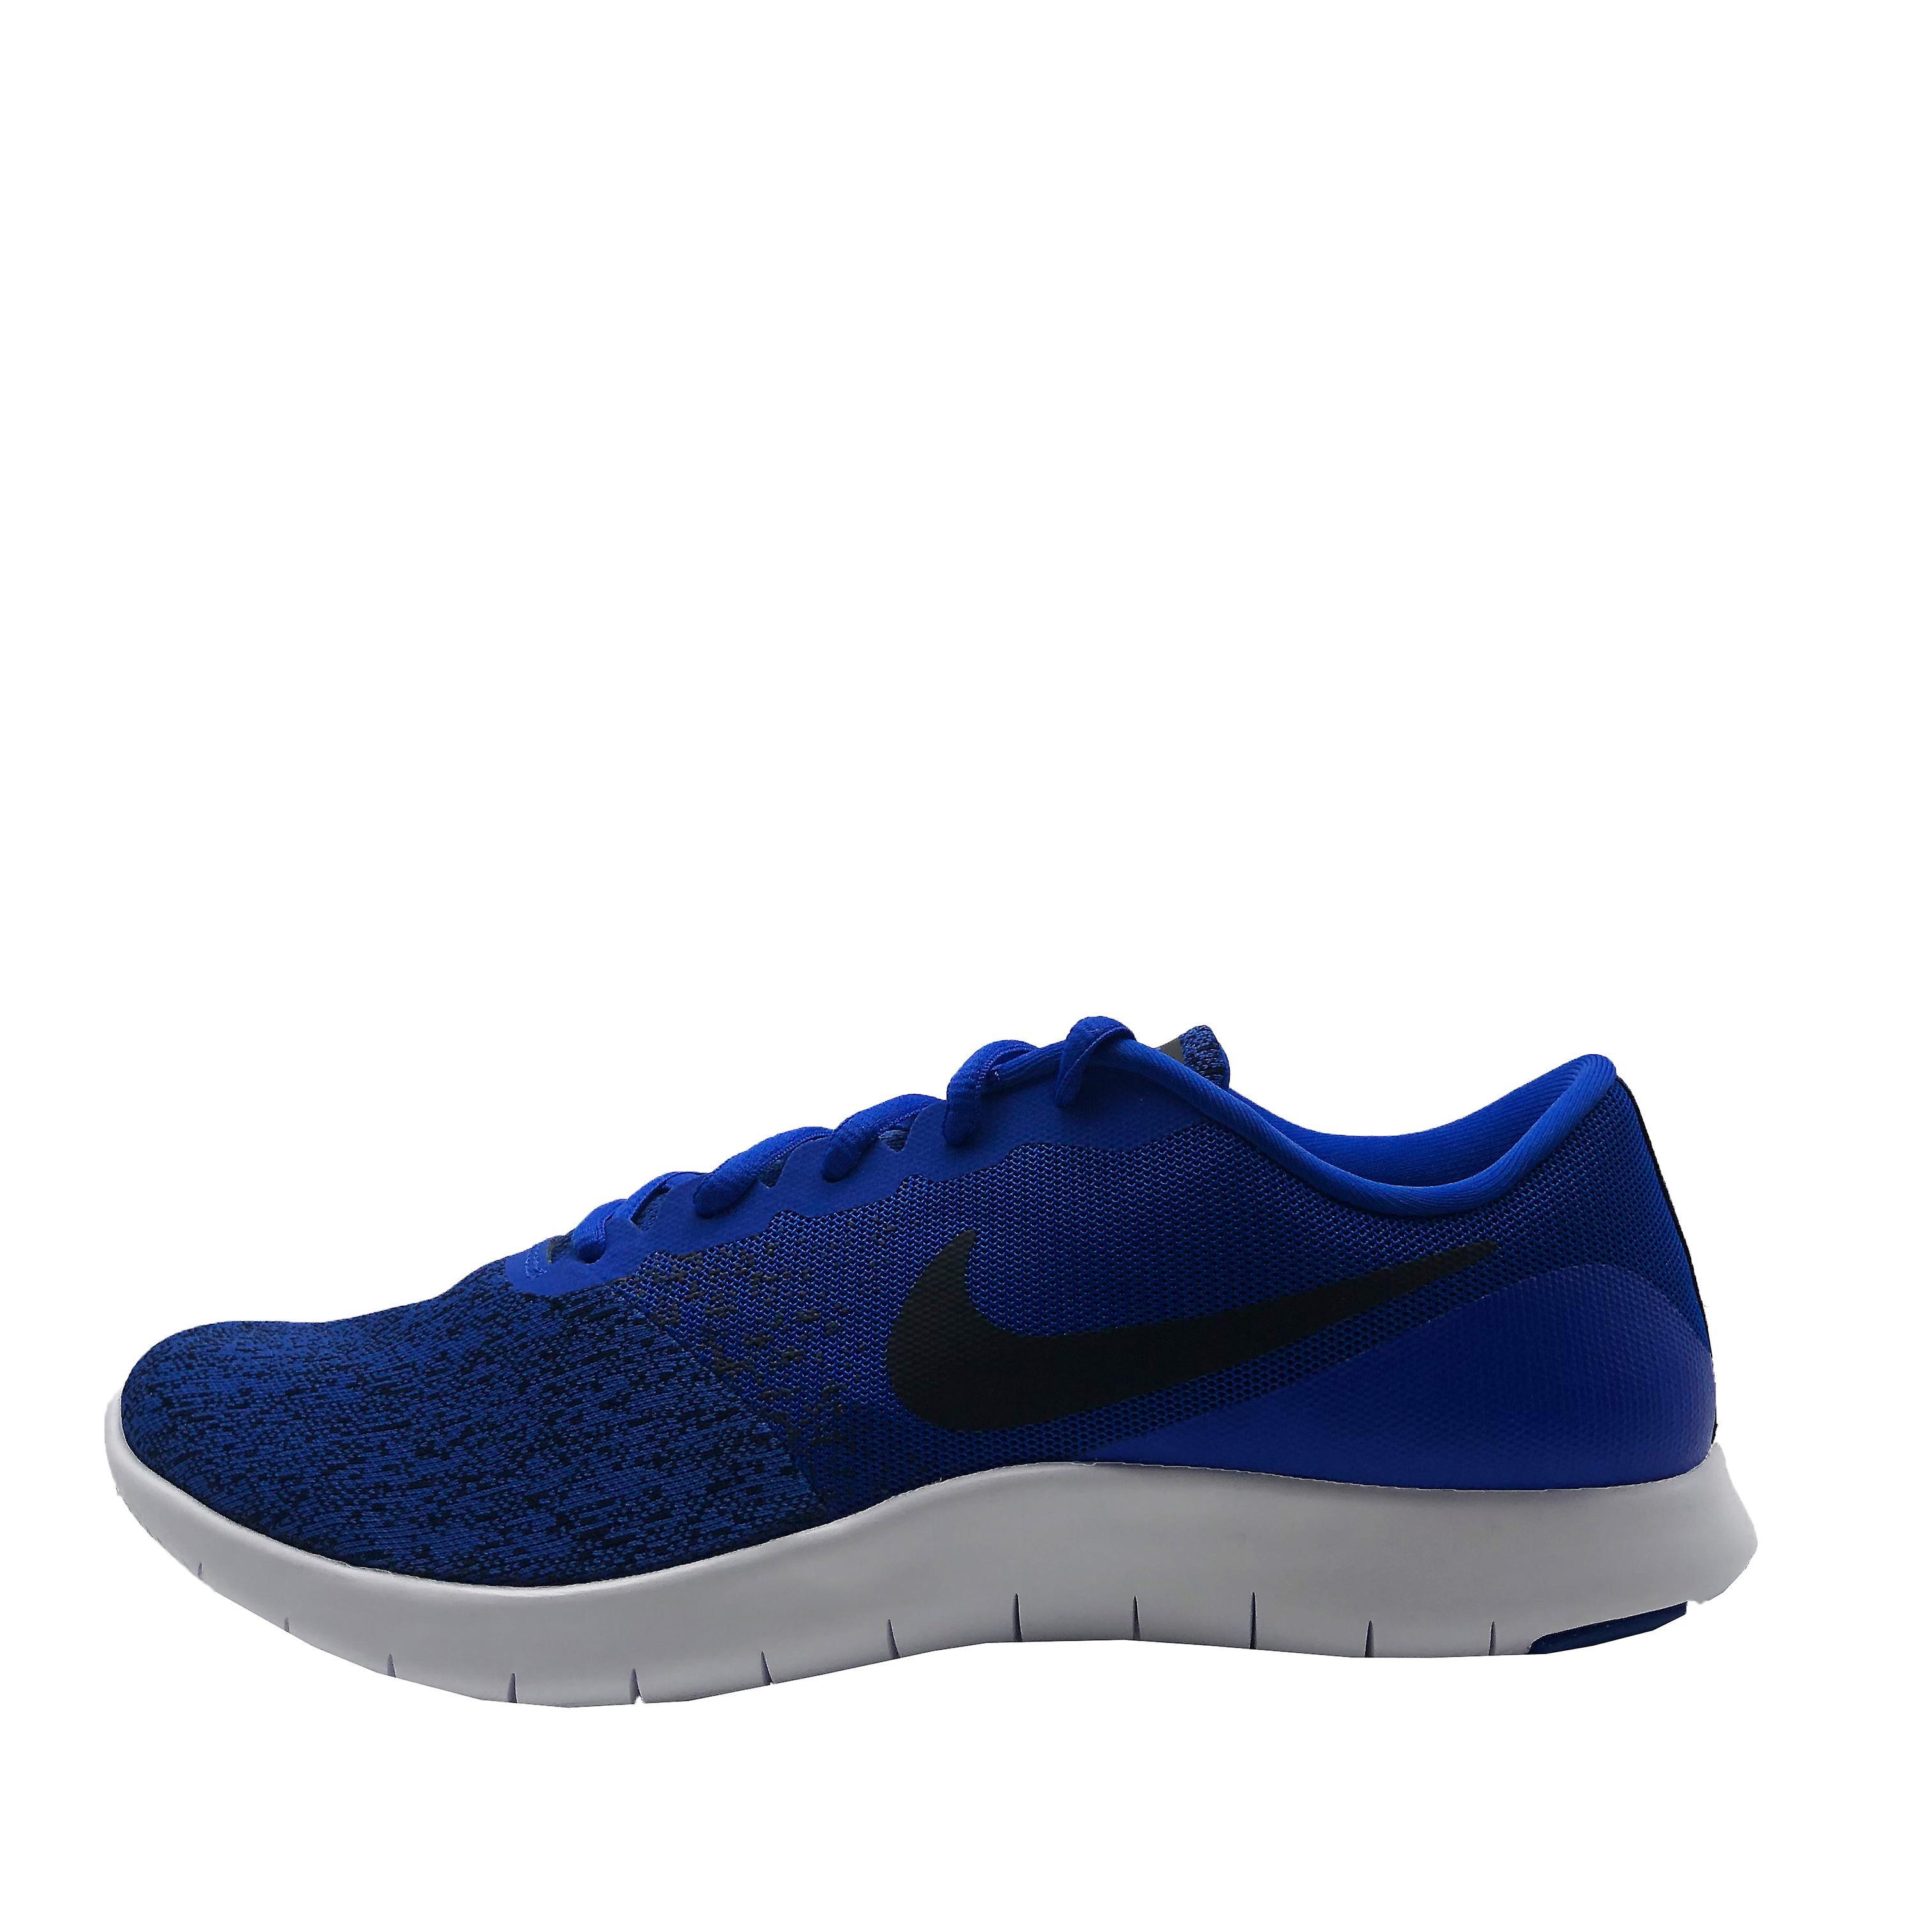 Nike Flex kontakt 908983 404 herr utbildare